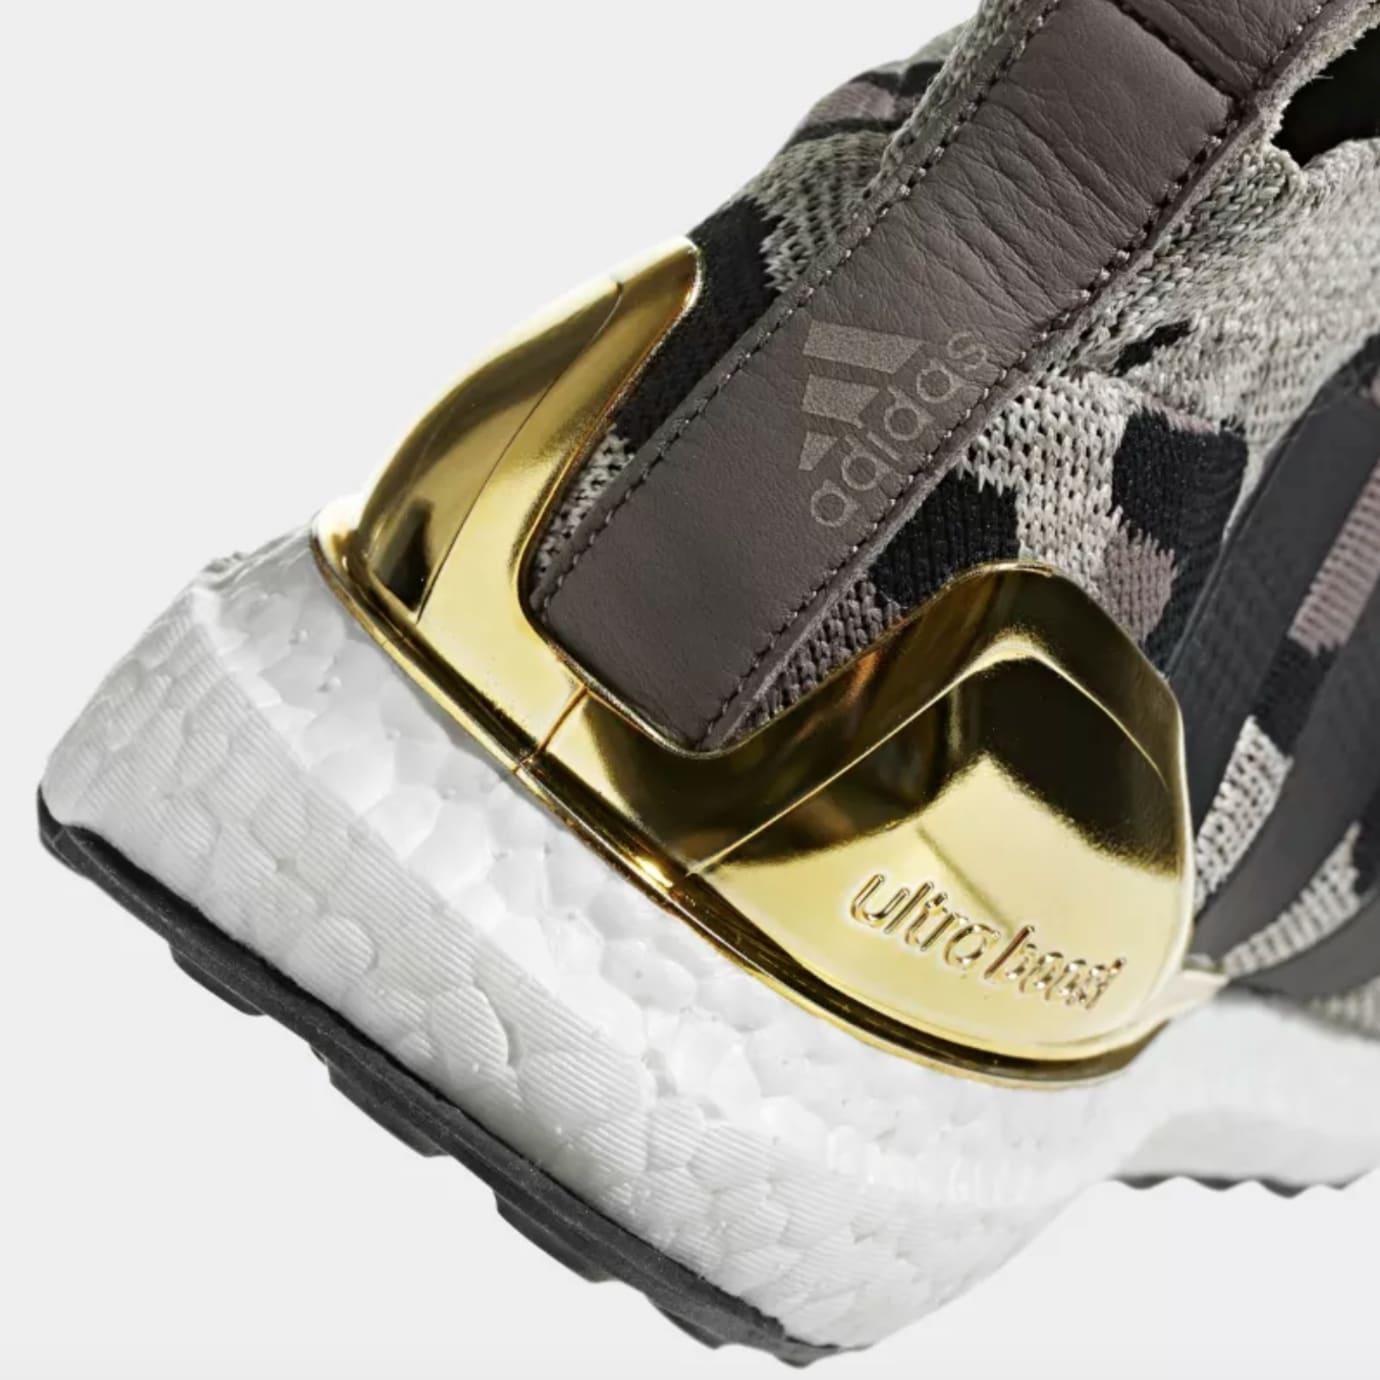 hot sale online e5f32 6b1d4 Image via Adidas Adidas A 16+ Ultra Boost Cheetah BB7418 Release Date